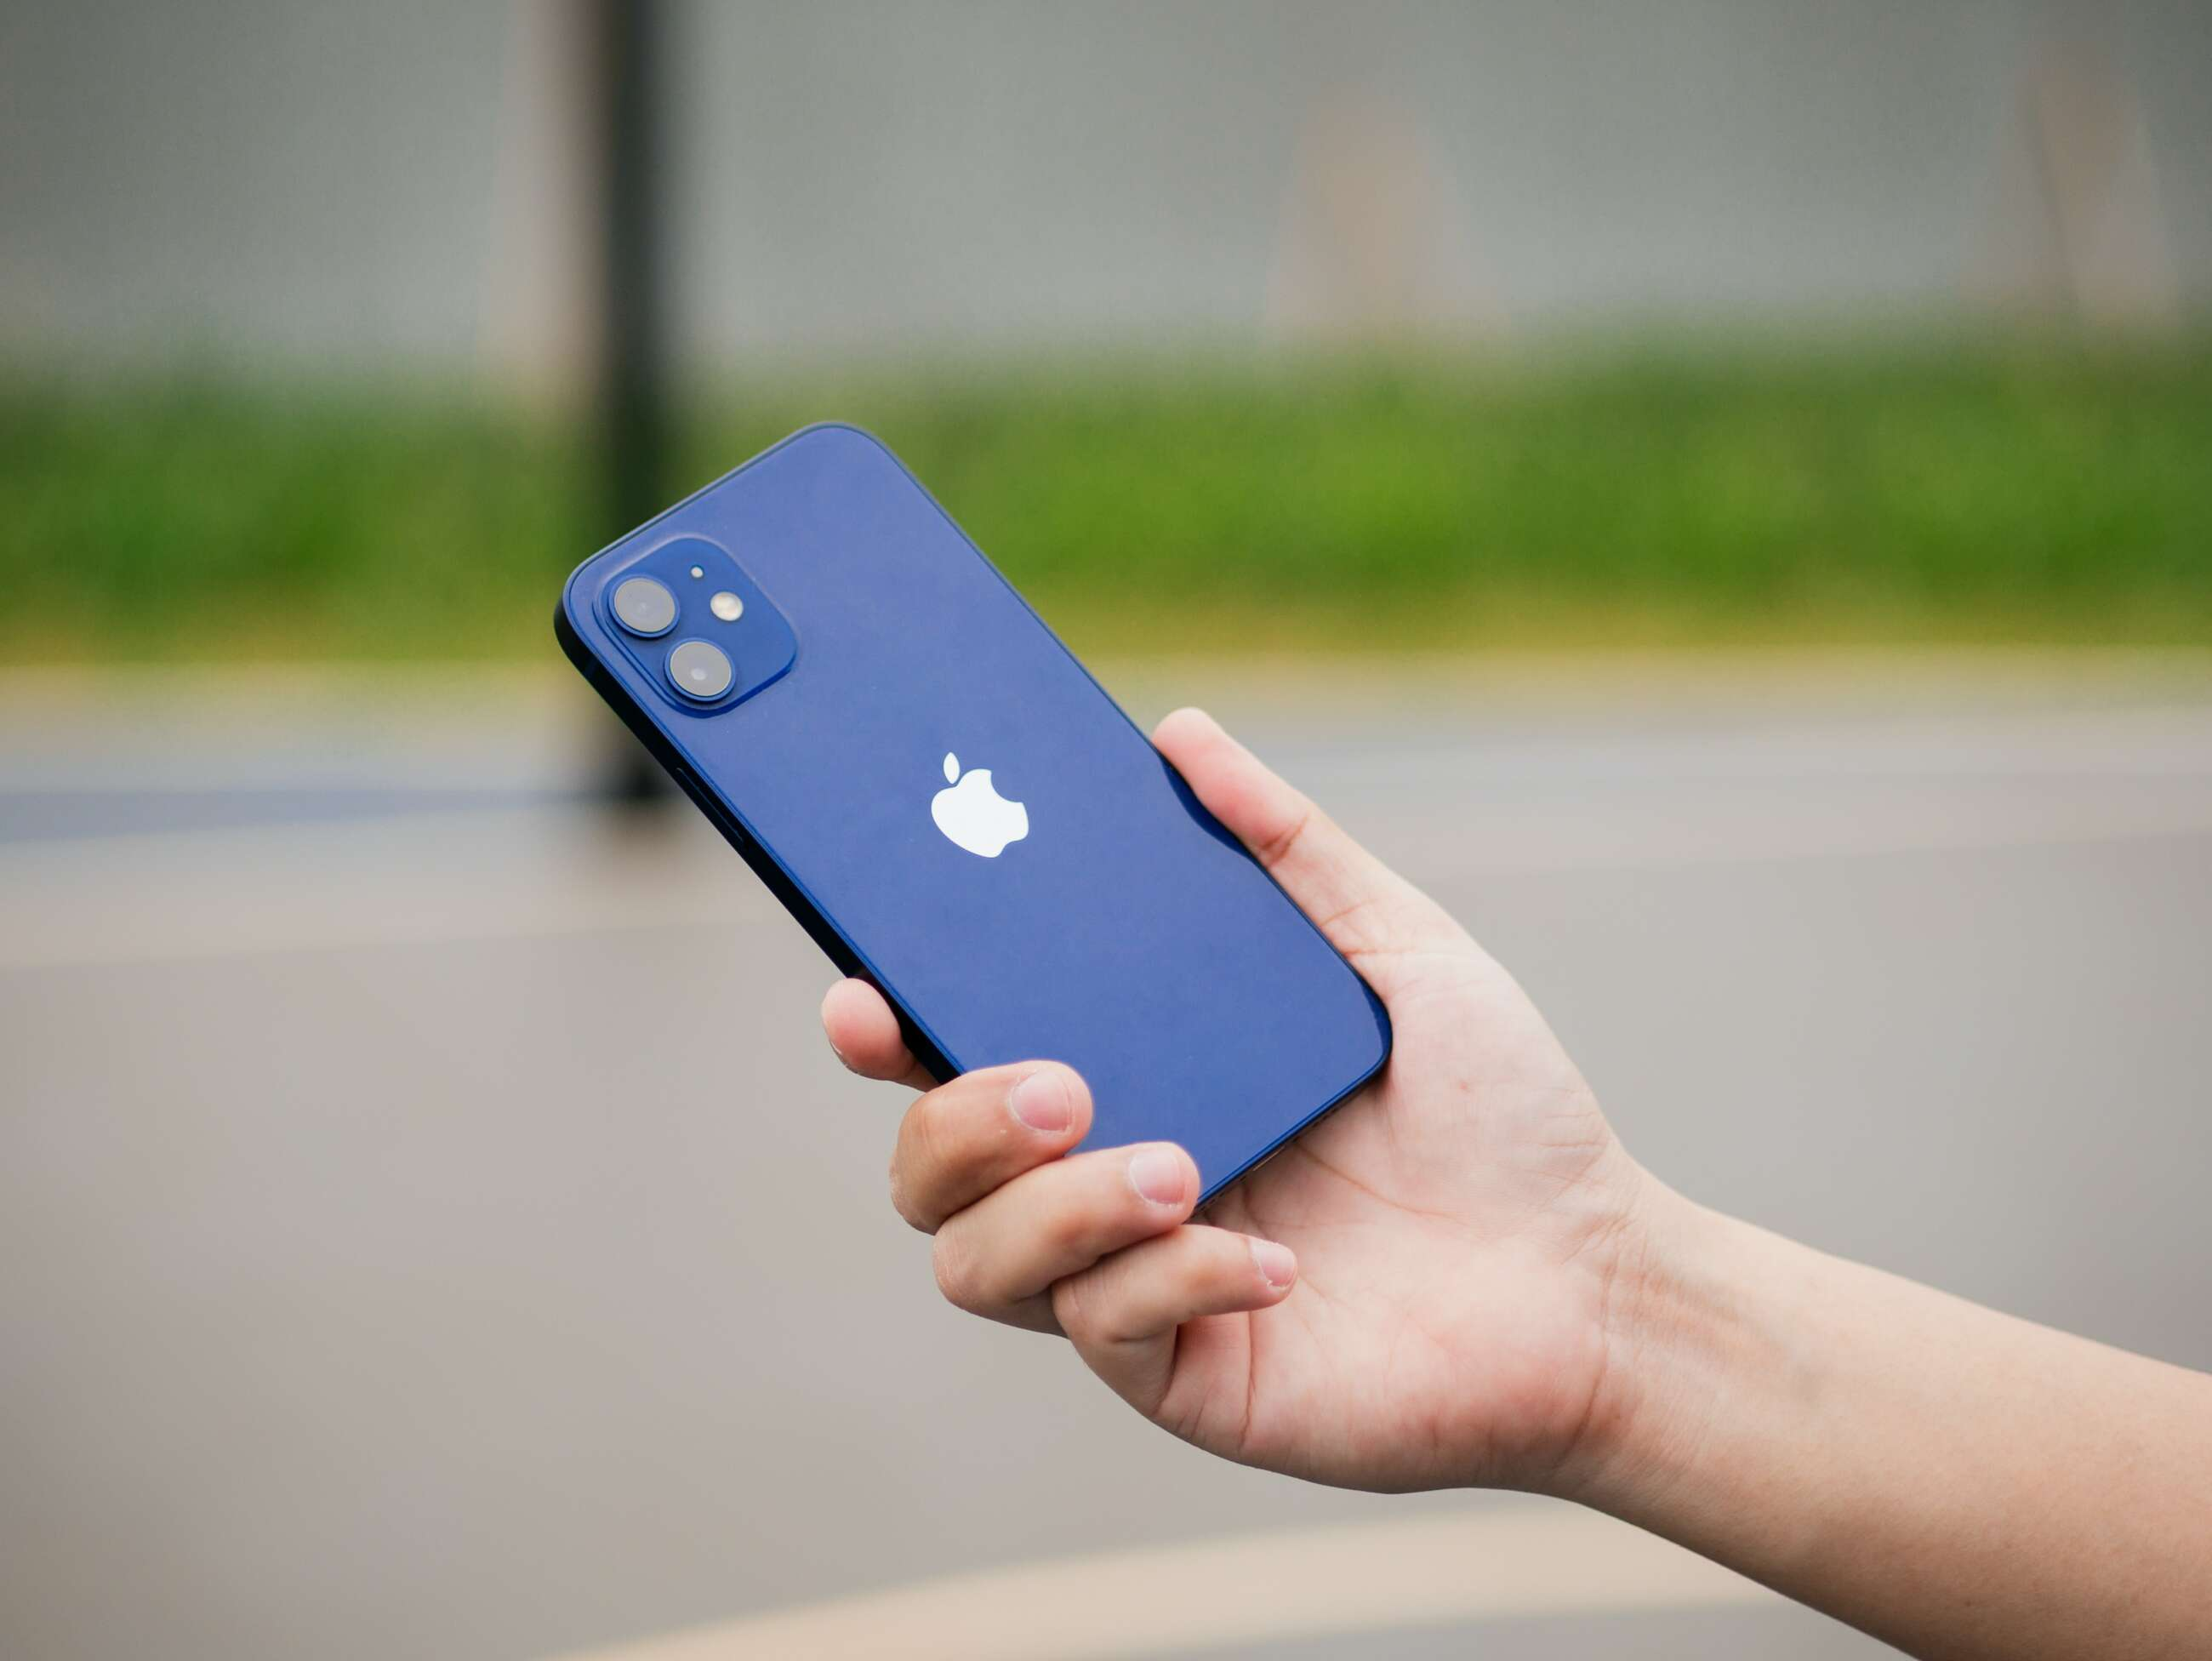 Para septiembre east previsto el reemplazo del iPhone 12. Foto: Shiwa ID